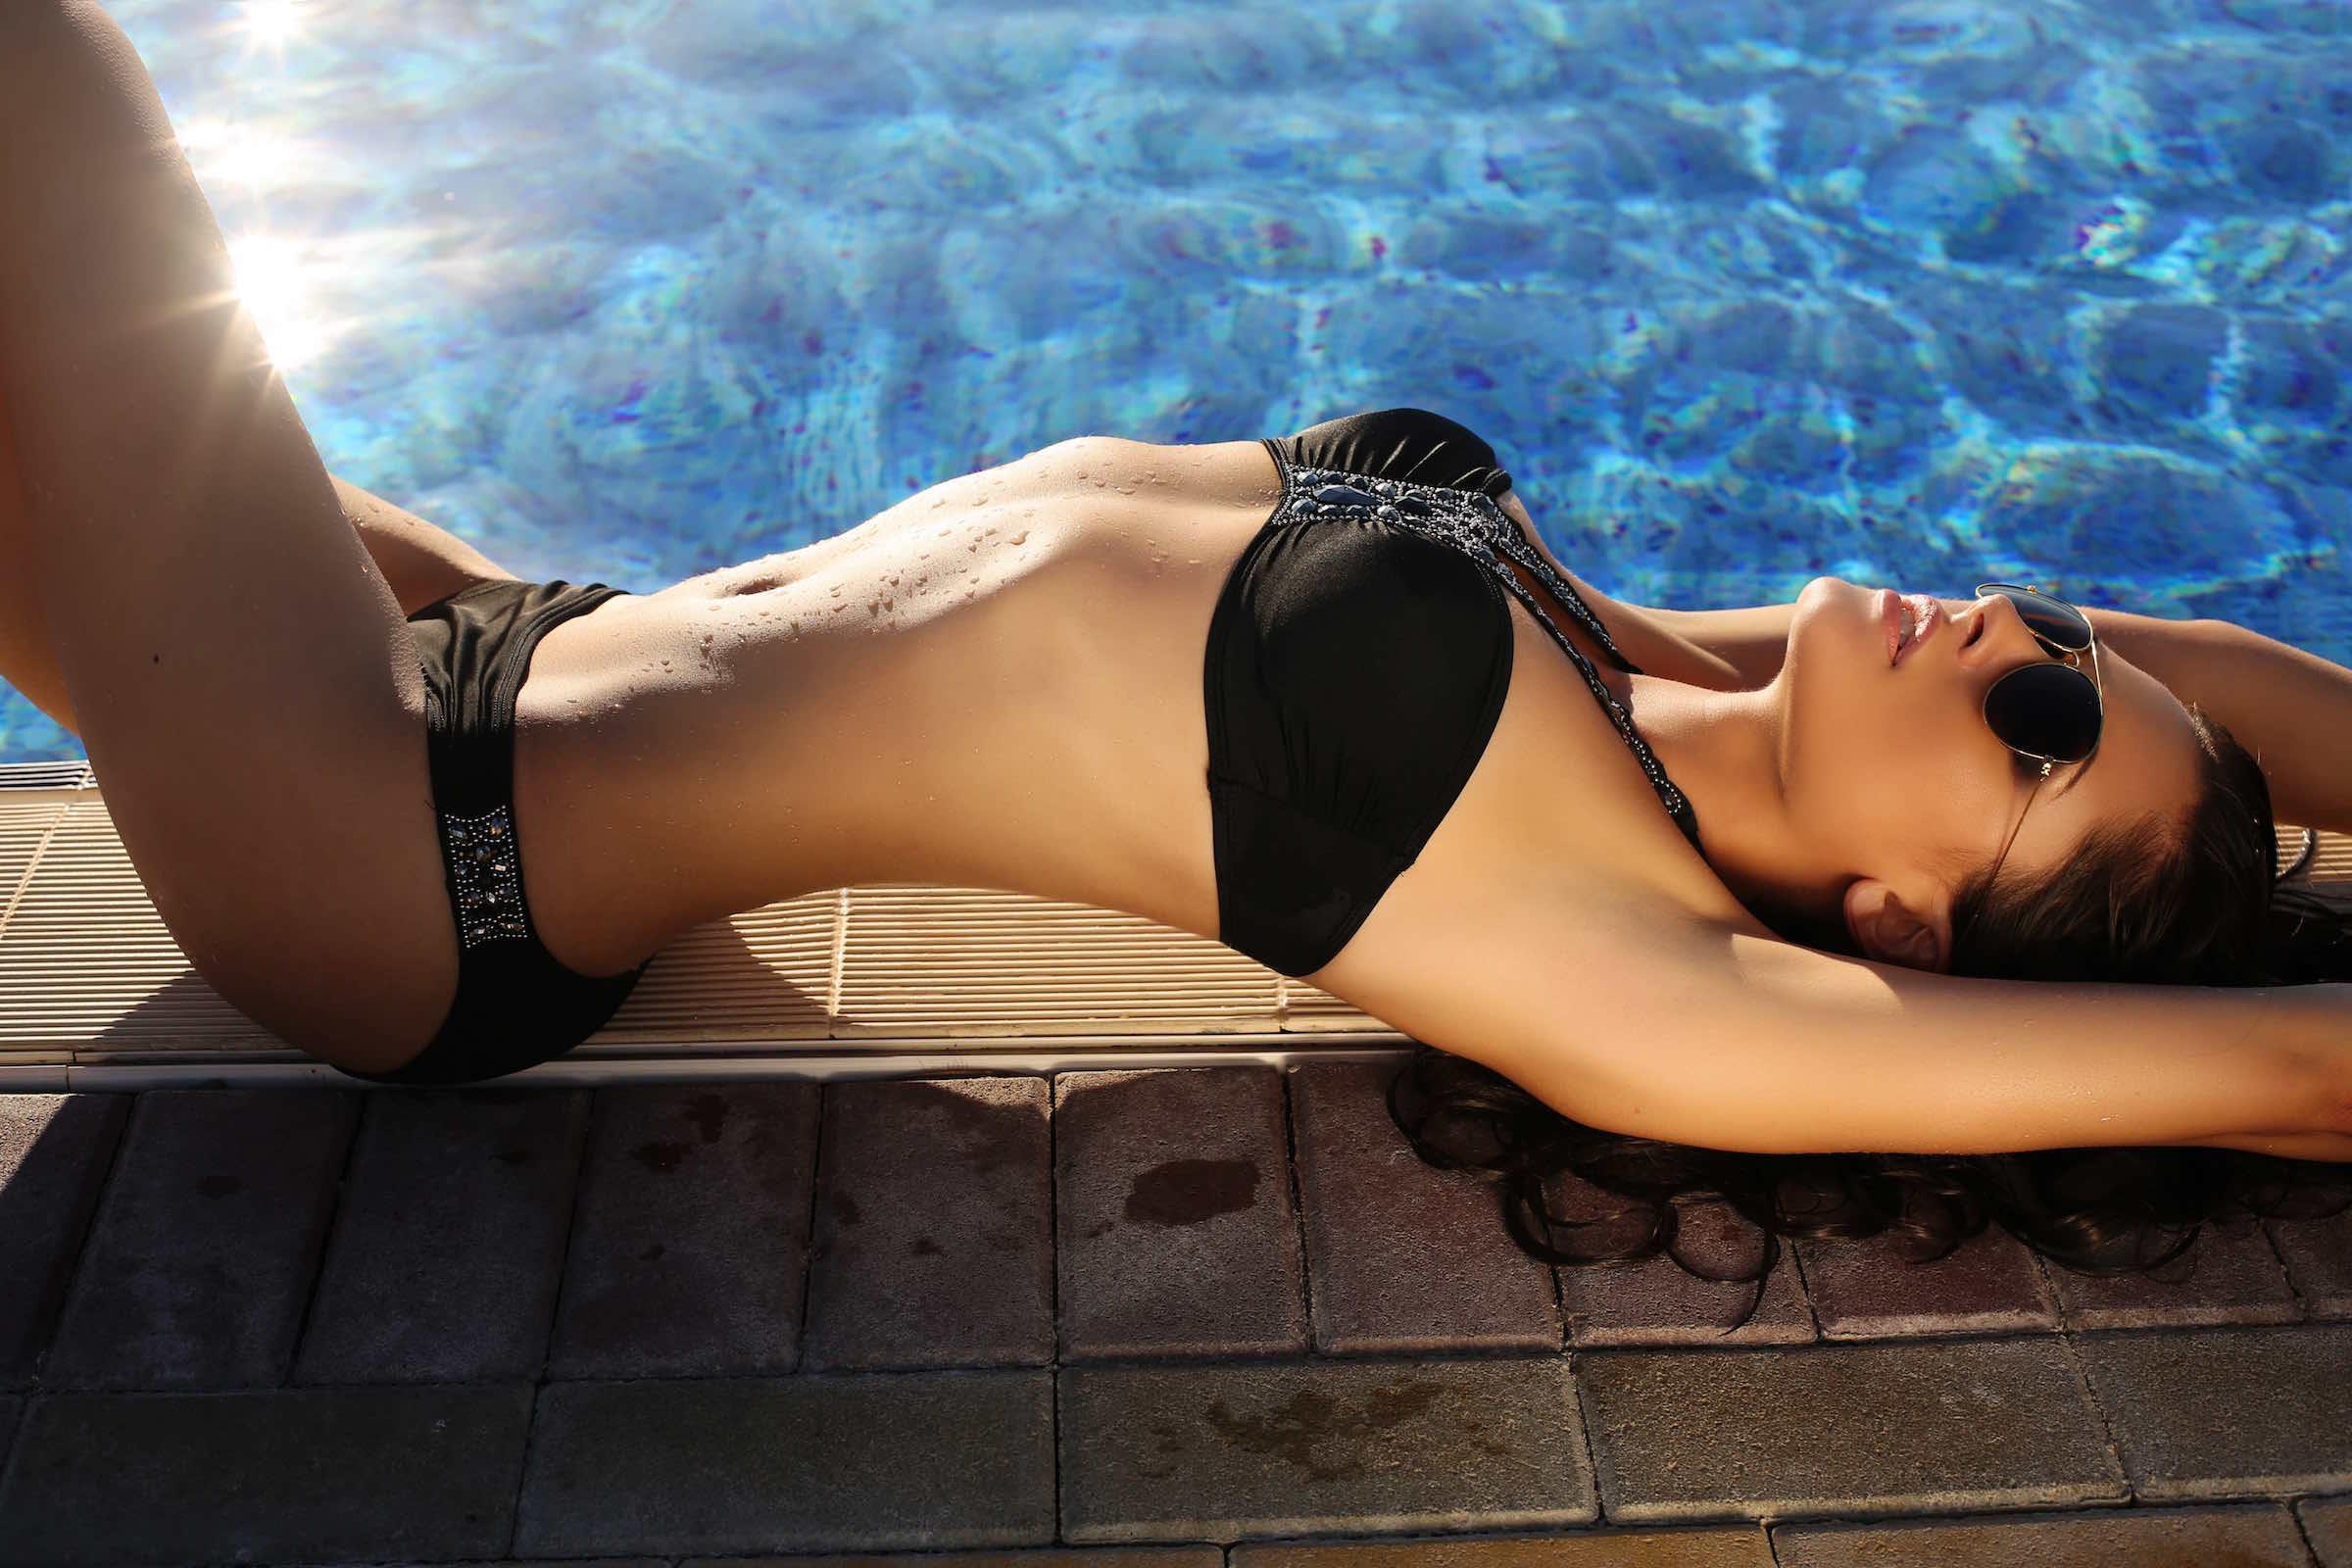 fashion photo of sexy beautiful girl with dark hair in black  bikini and sunglasses relaxing beside a swimming pool